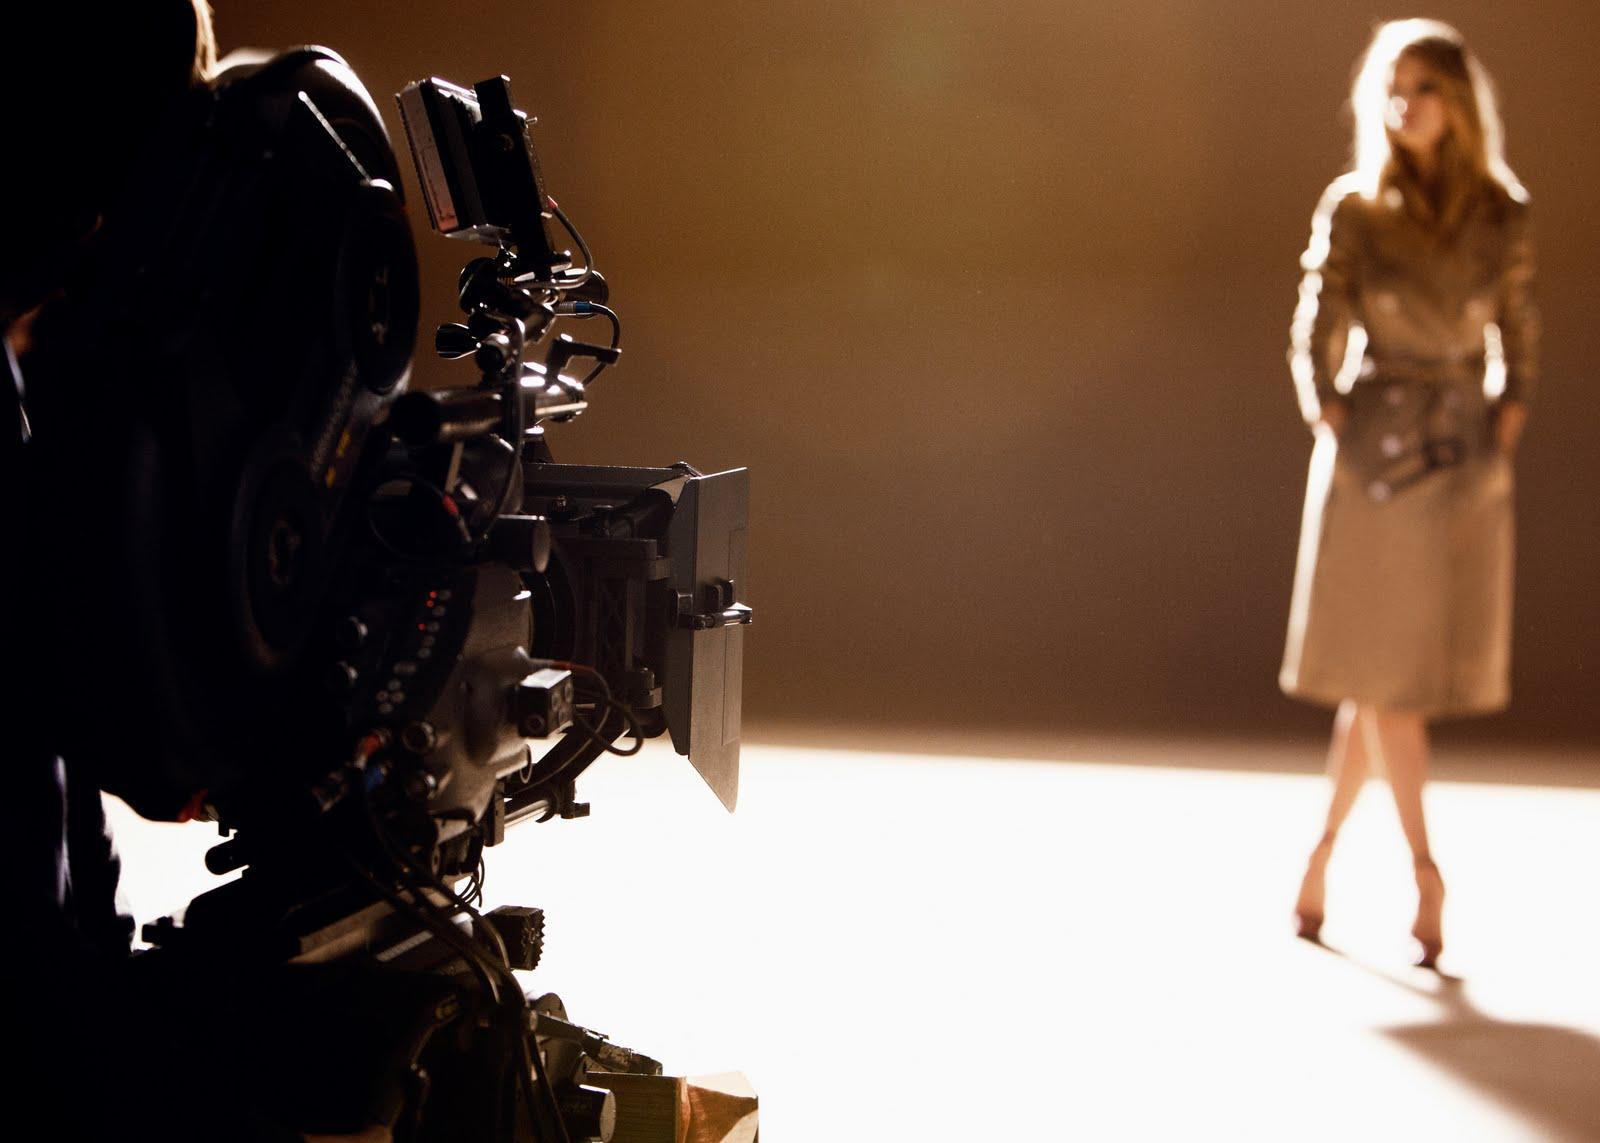 http://1.bp.blogspot.com/-97sP5pJ7Eu4/TlwVjsvJdZI/AAAAAAAAOOs/3IpKVB_M2n0/s1600/burberry+body+behind+the+scenes.jpg